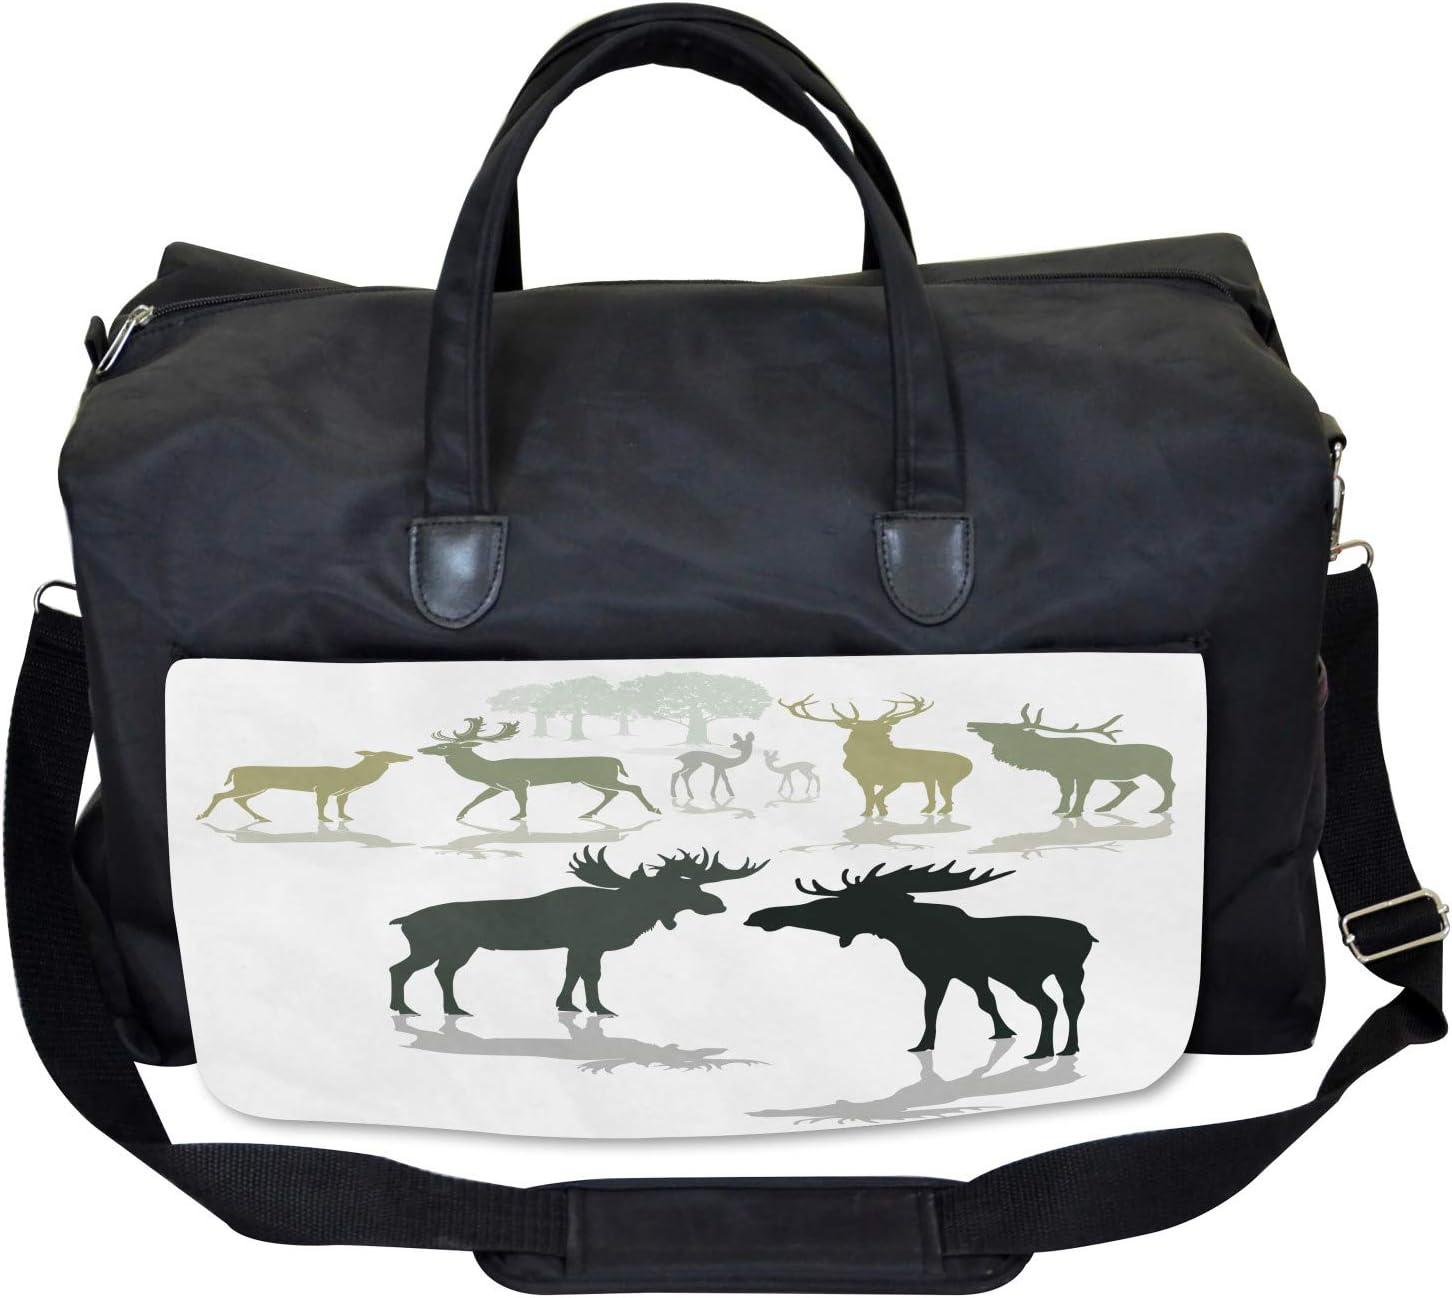 Ambesonne Antlers Gym Bag Large Weekender Carry-on Elk Deer Fawn Forest